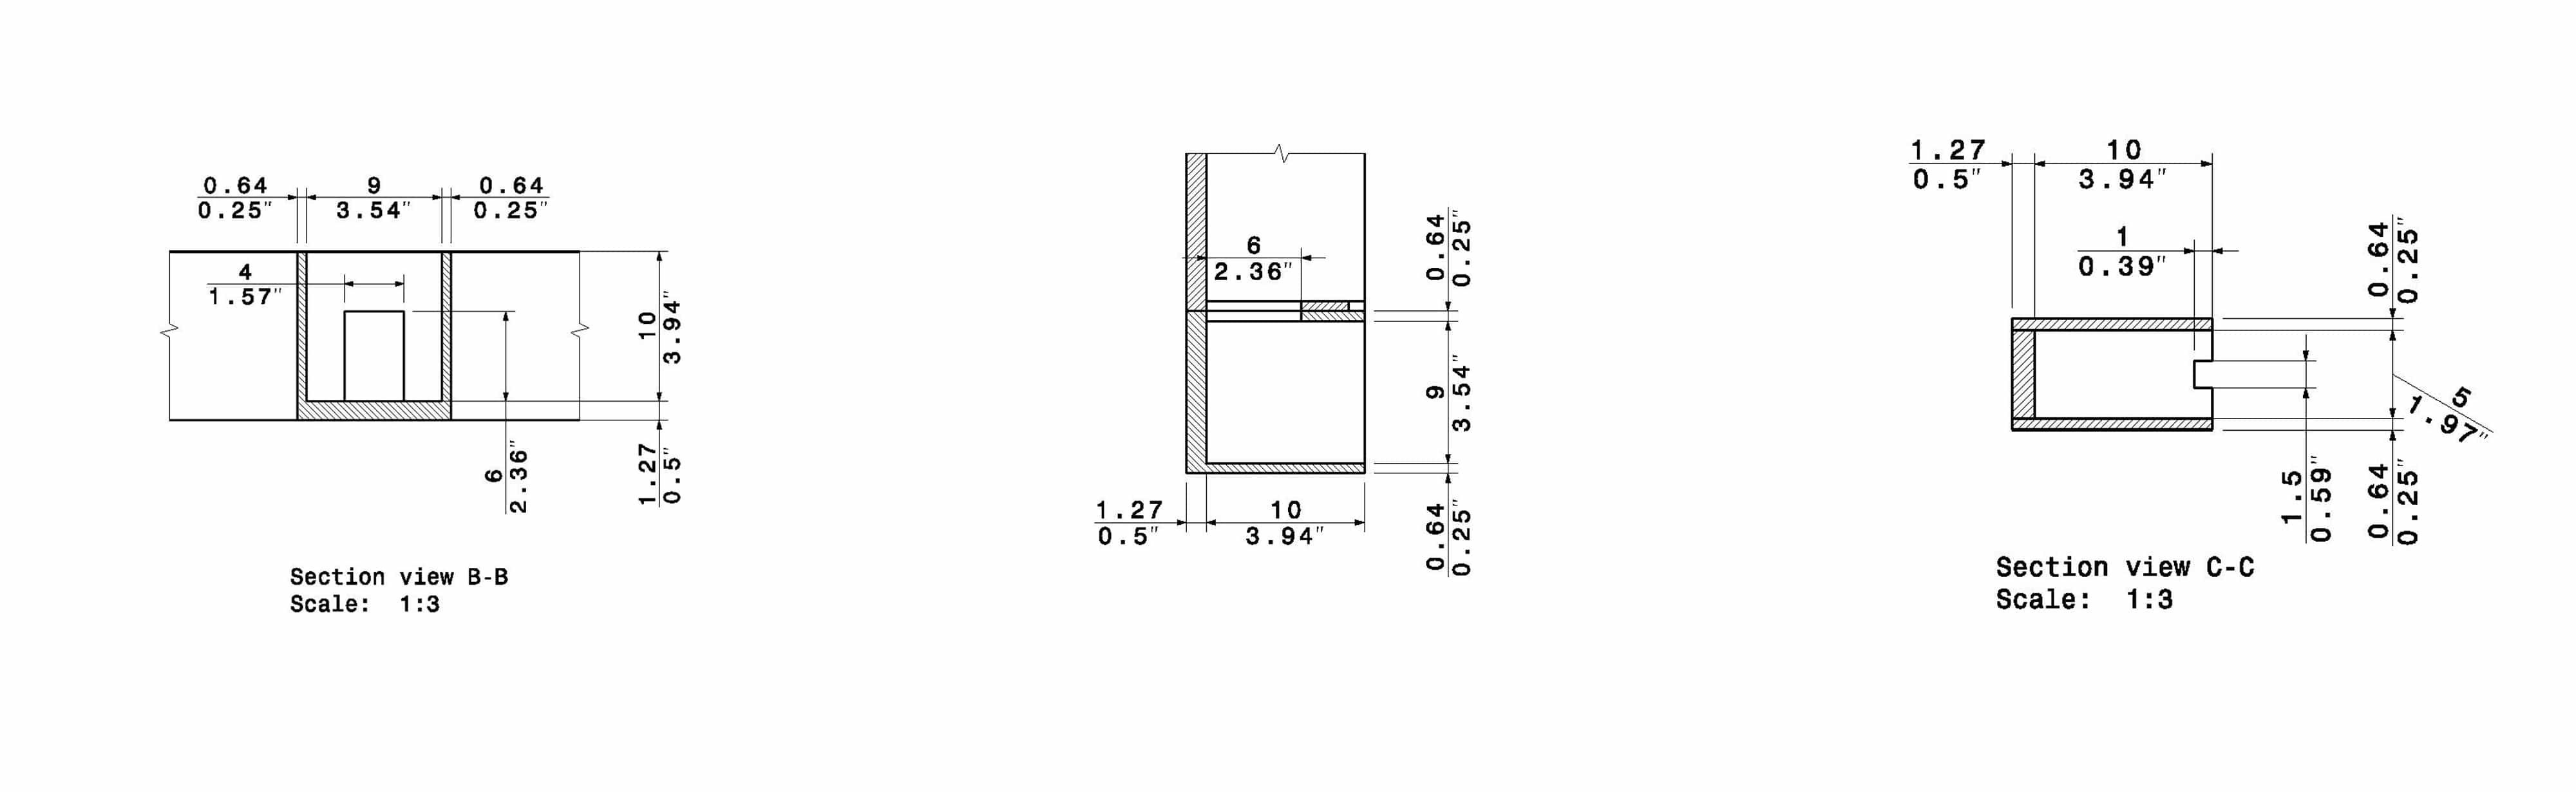 Radial Arm Maze - Goal Box - Mouse - Image 3